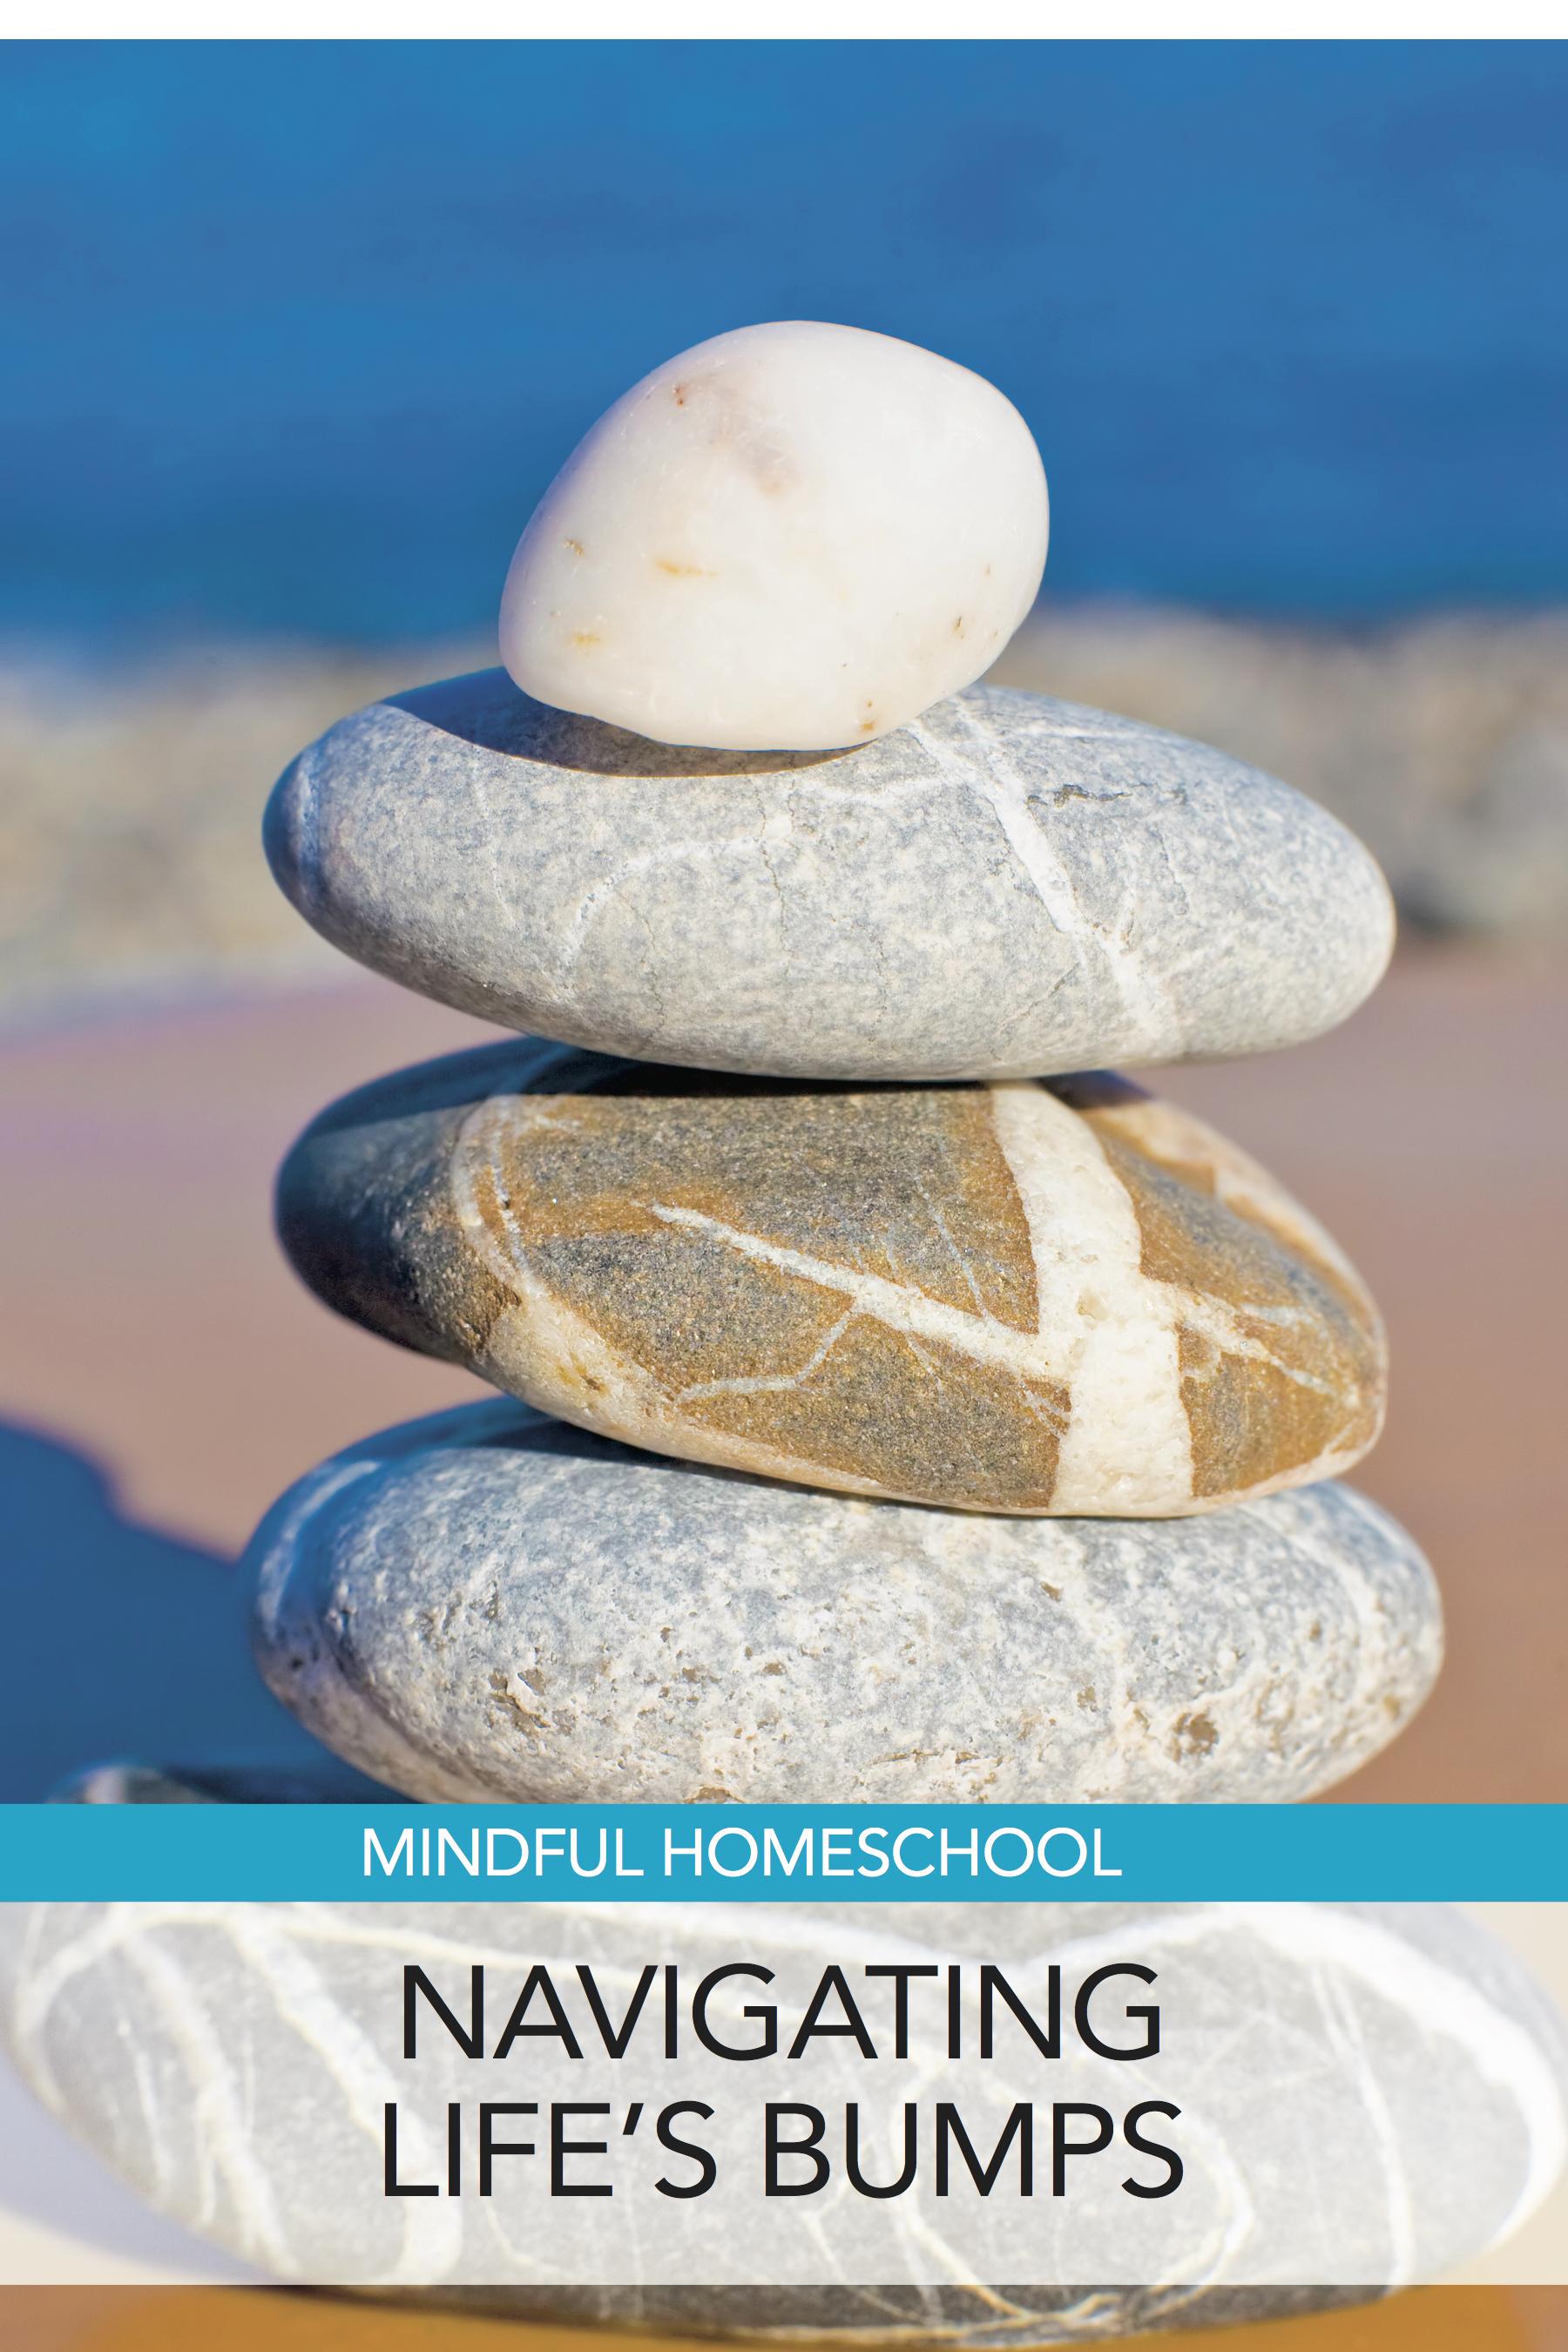 Mindful Homeschool: Navigating Life's Bumps